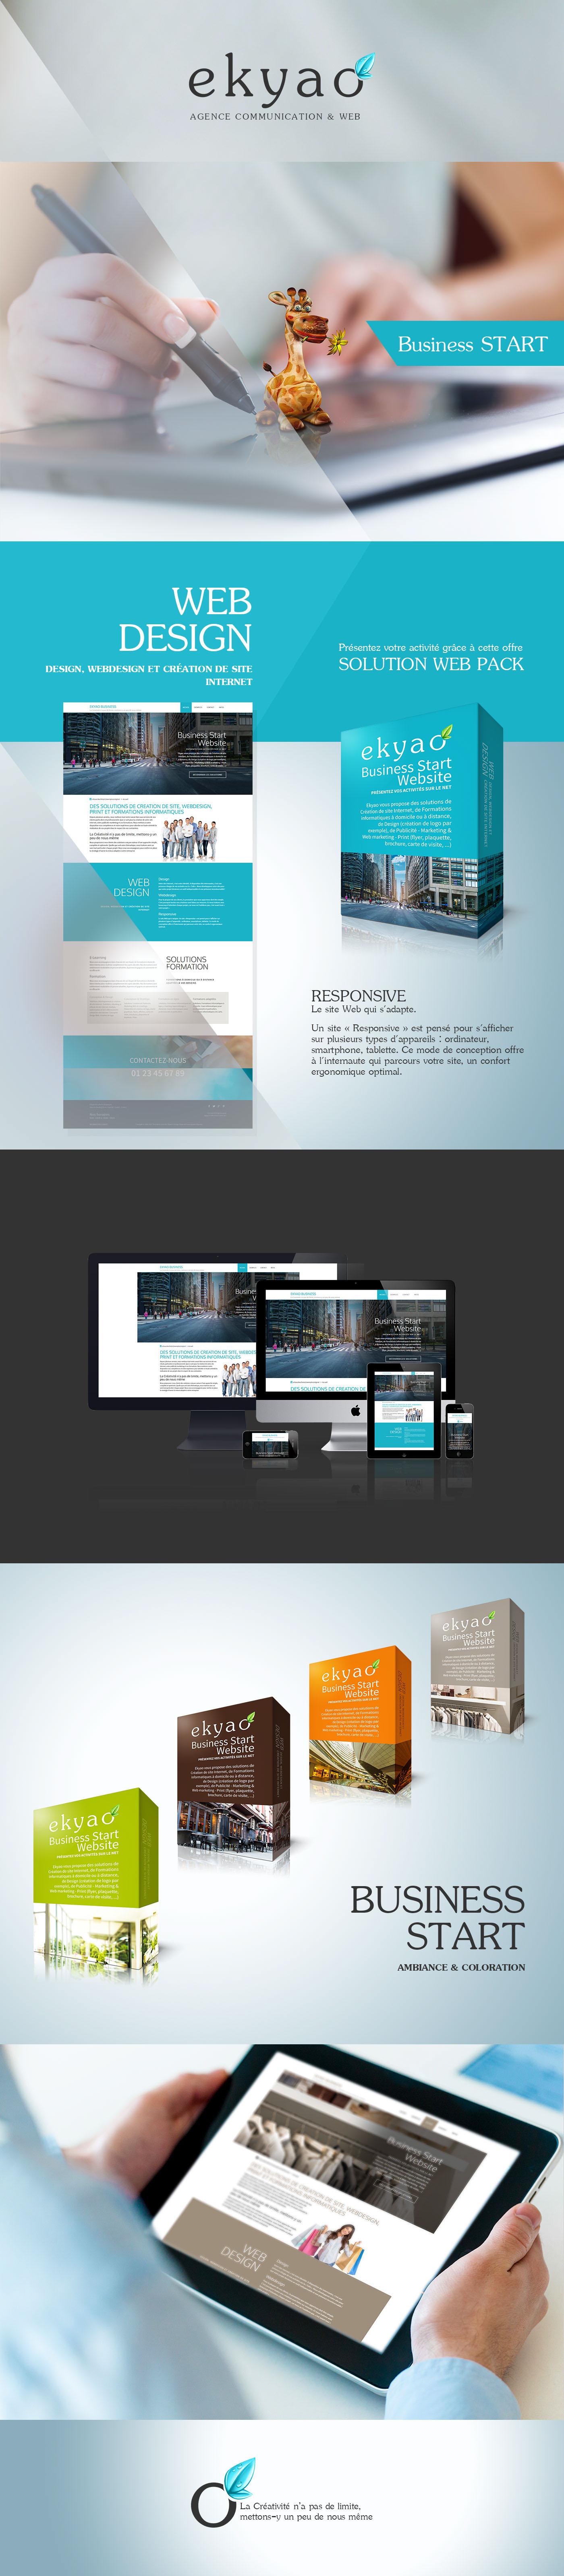 Adobe Portfolio ekyao business start agence communication design presentation logo Responsive Website Webdesign